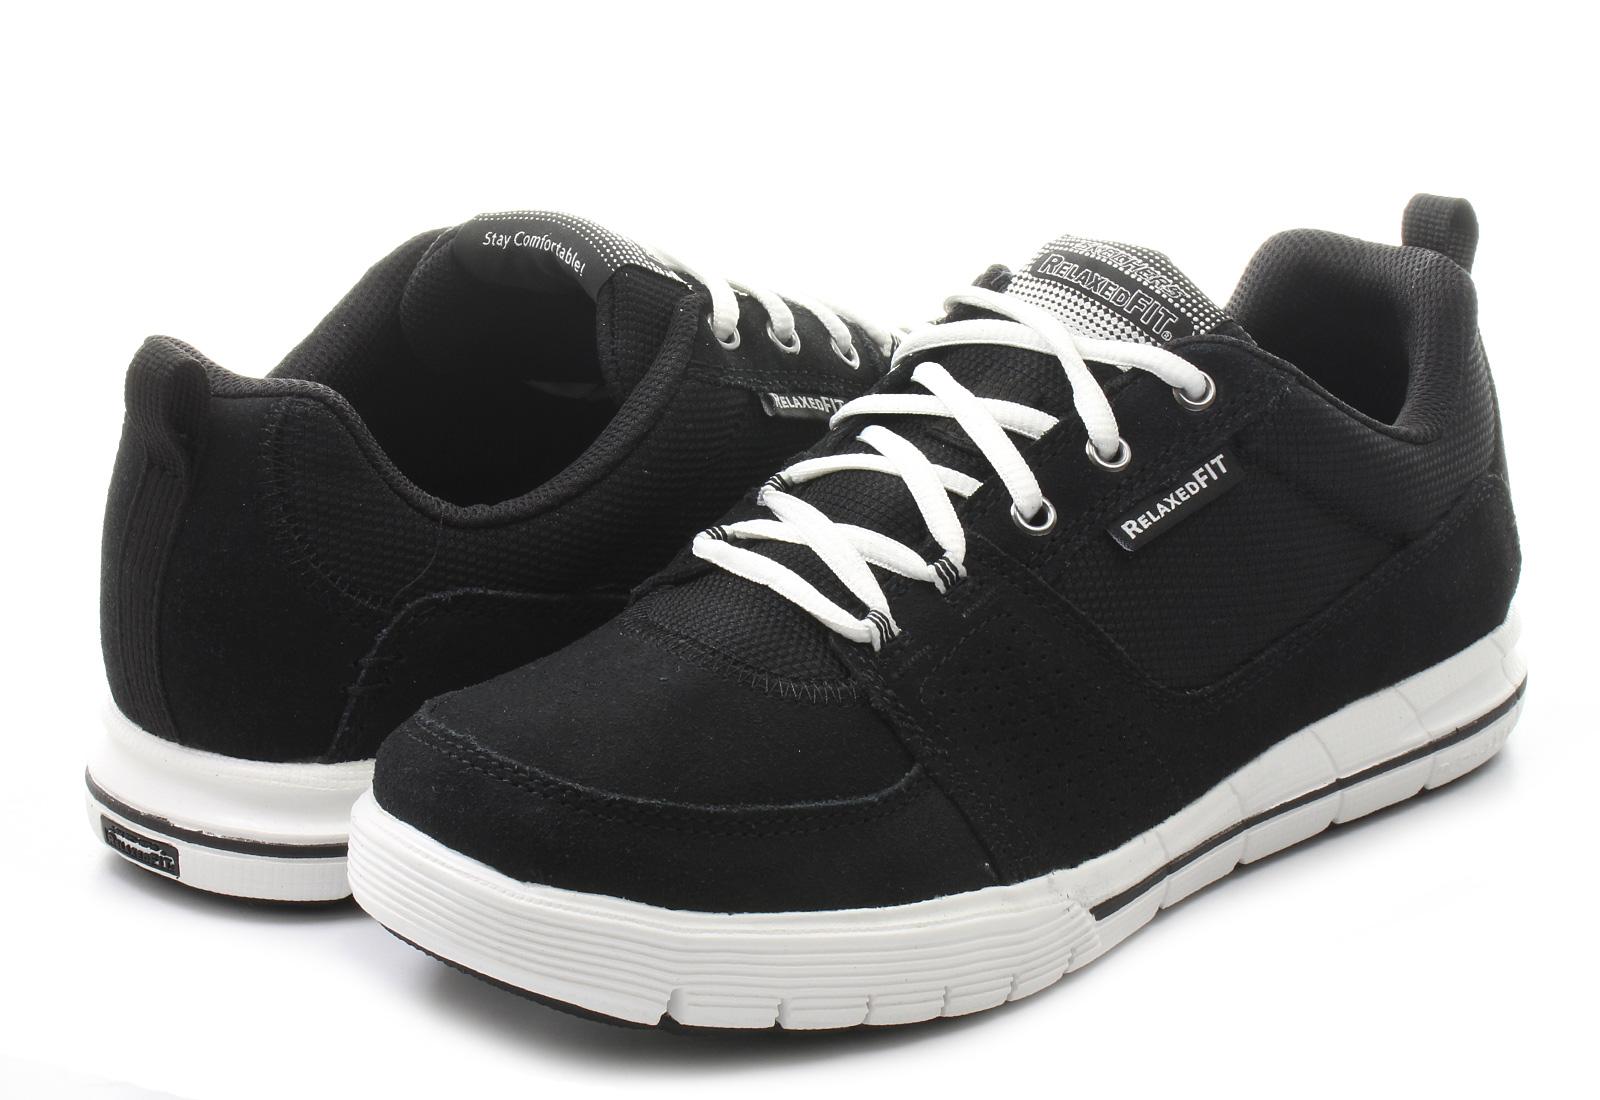 Skechers Cipő - Arcade Ii- Next Move - 51138-bkw - Office Shoes ... 0ae28c32f2